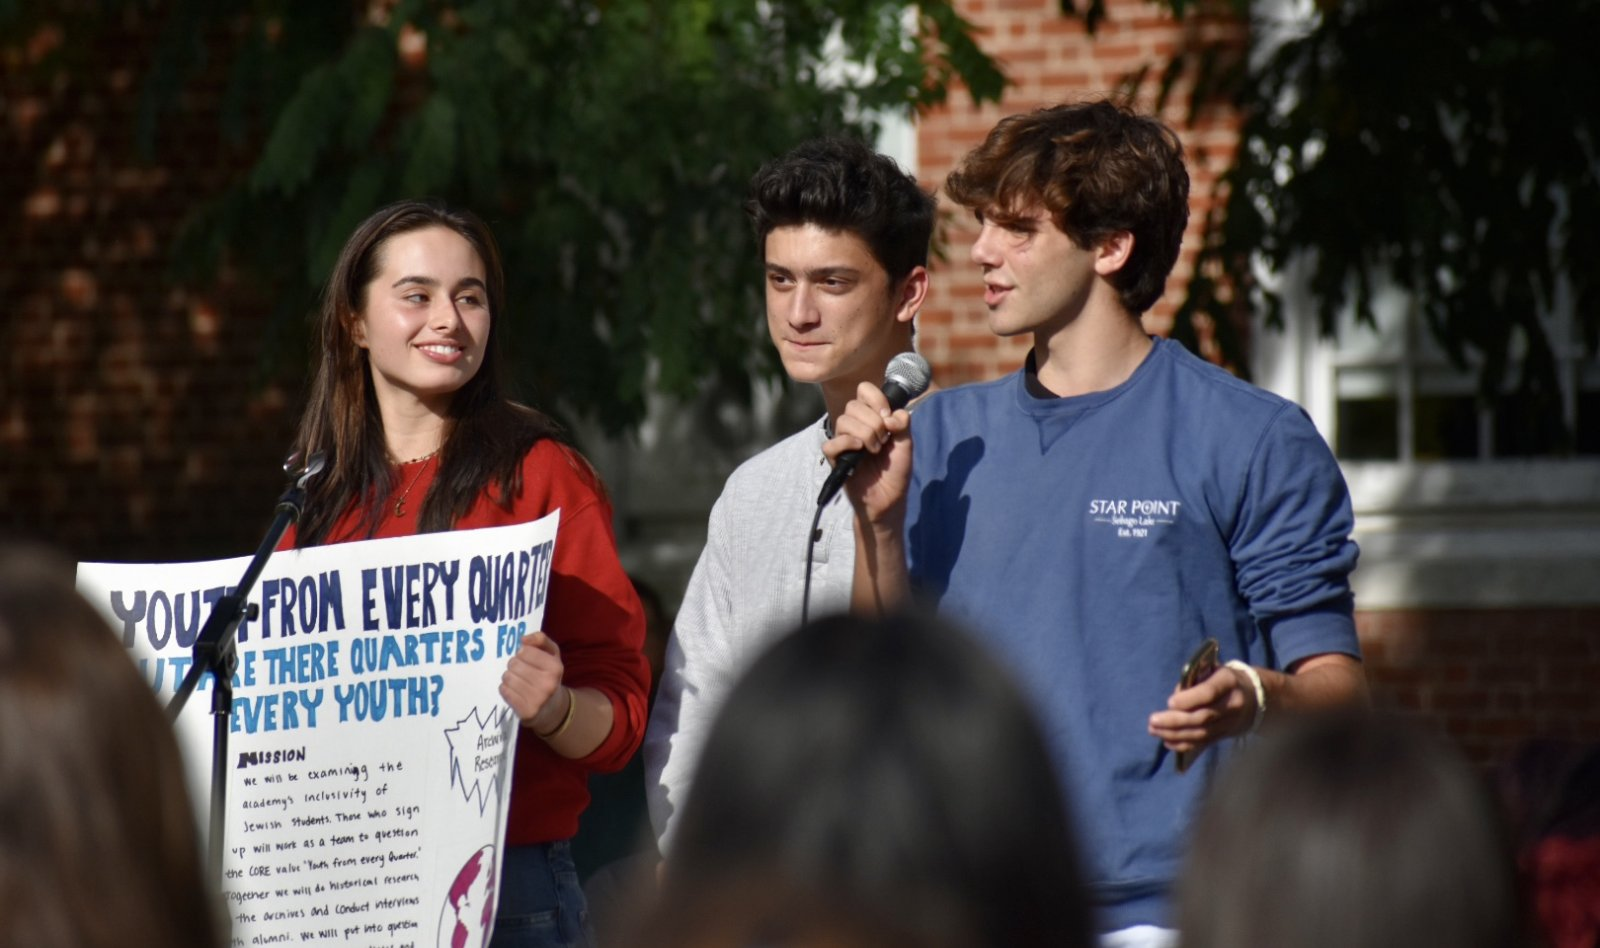 Juliet Ortiz, Niko Matheos and Georgie Venci address the crowd.